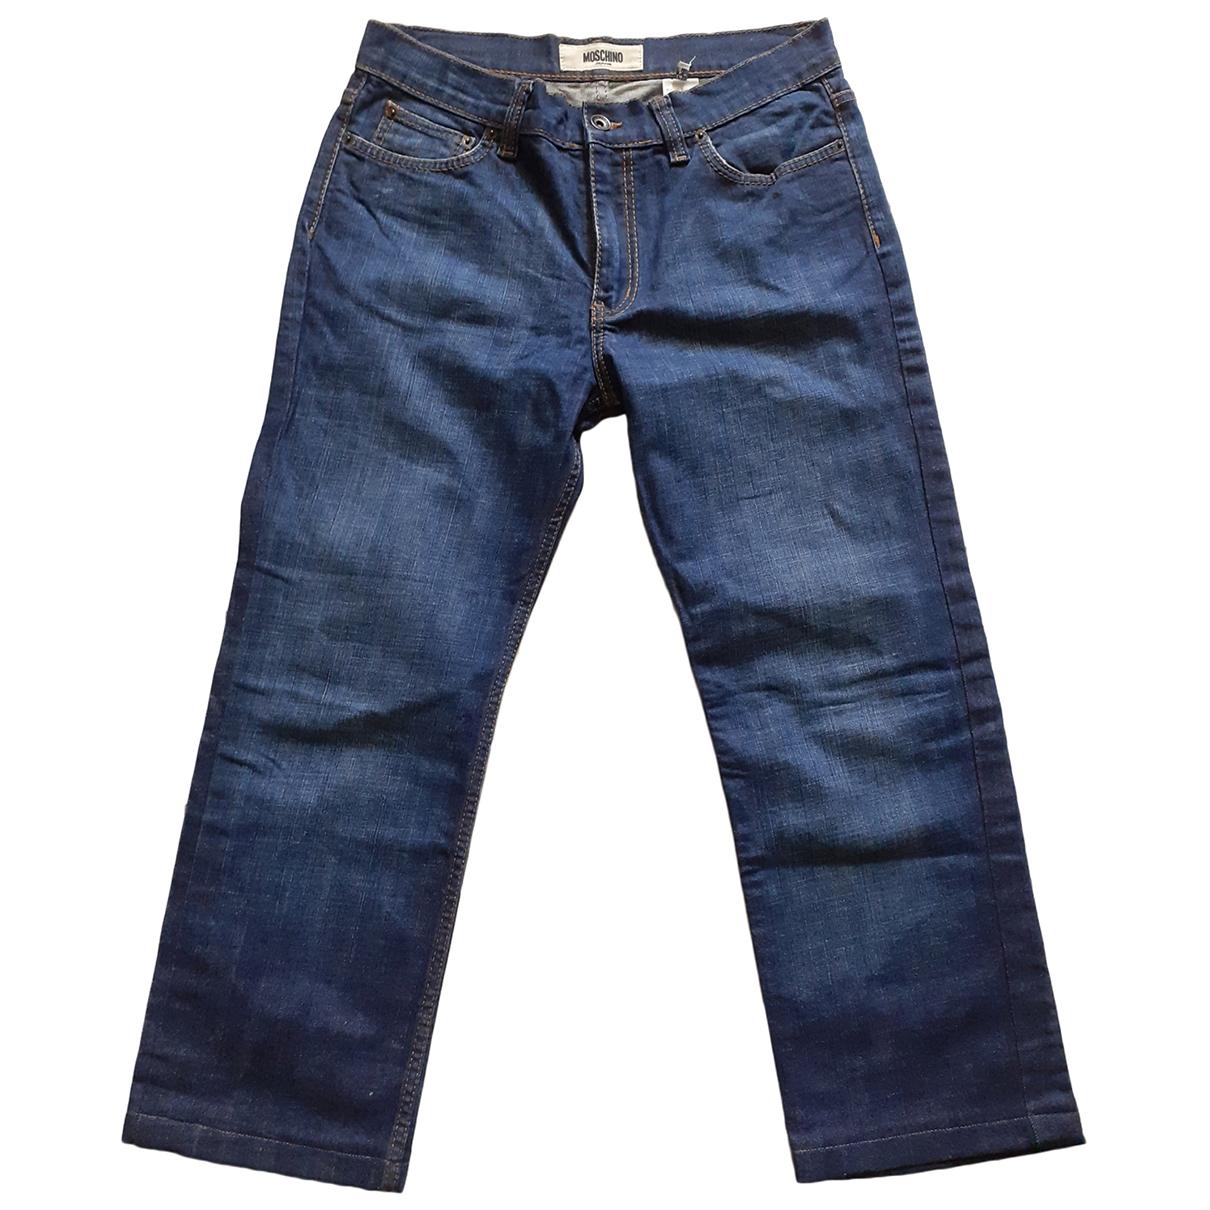 Moschino \N Hose in  Marine Denim - Jeans